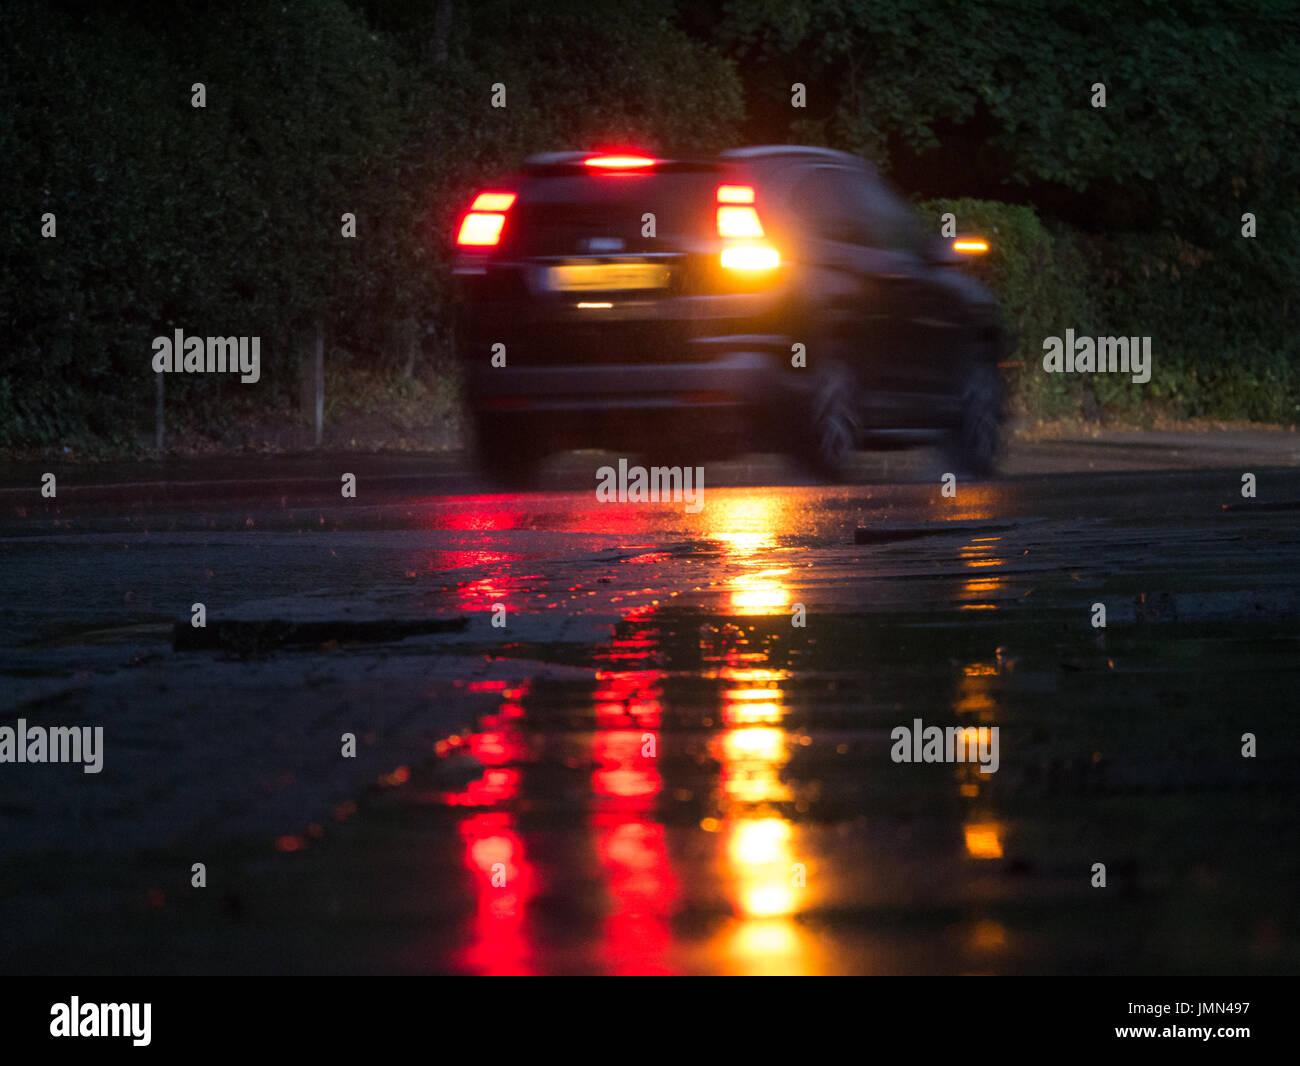 Car Lights In The Rain Stock Photos Car Lights In The Rain Stock